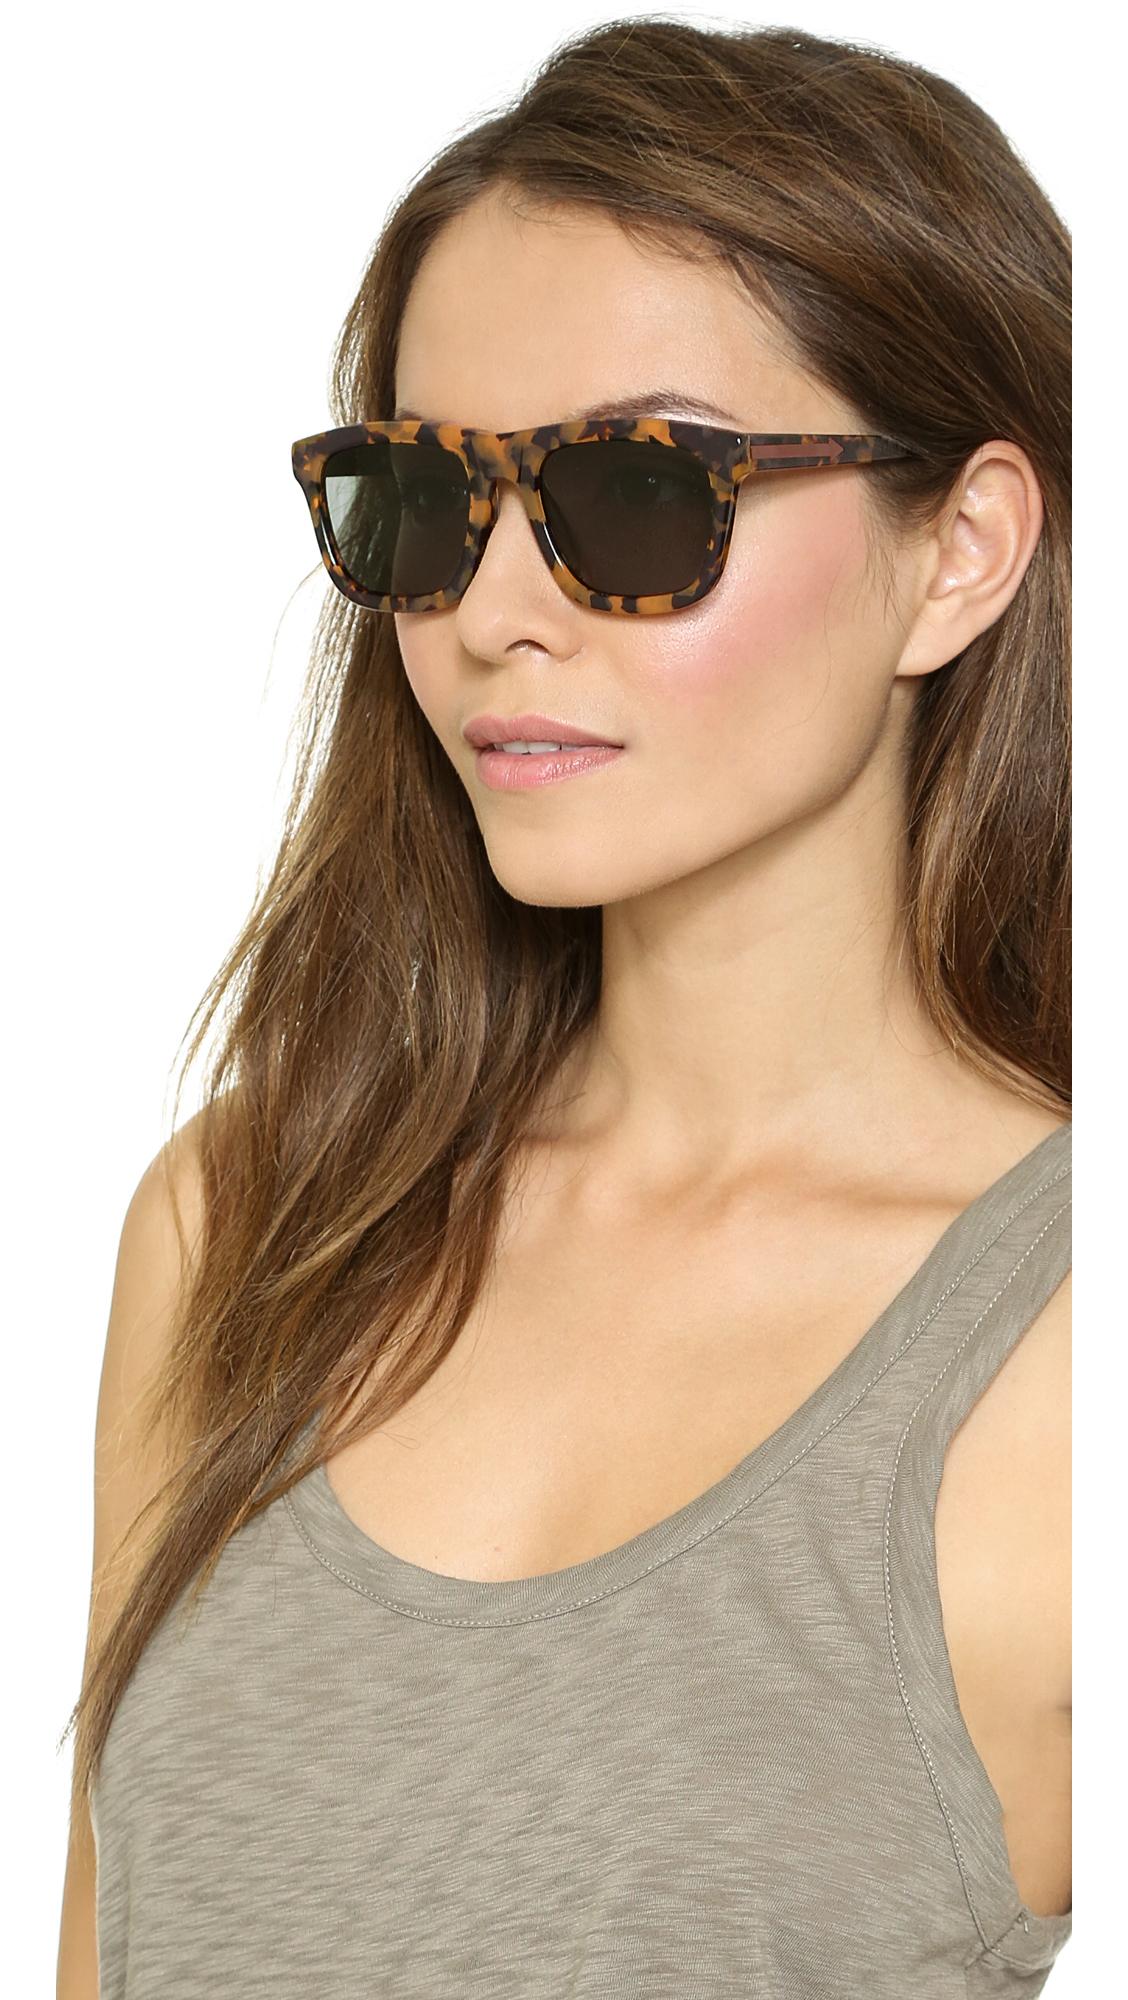 6bfb1fff607 Karen Walker Special Fit Deep Freeze Sunglasses in Brown - Lyst